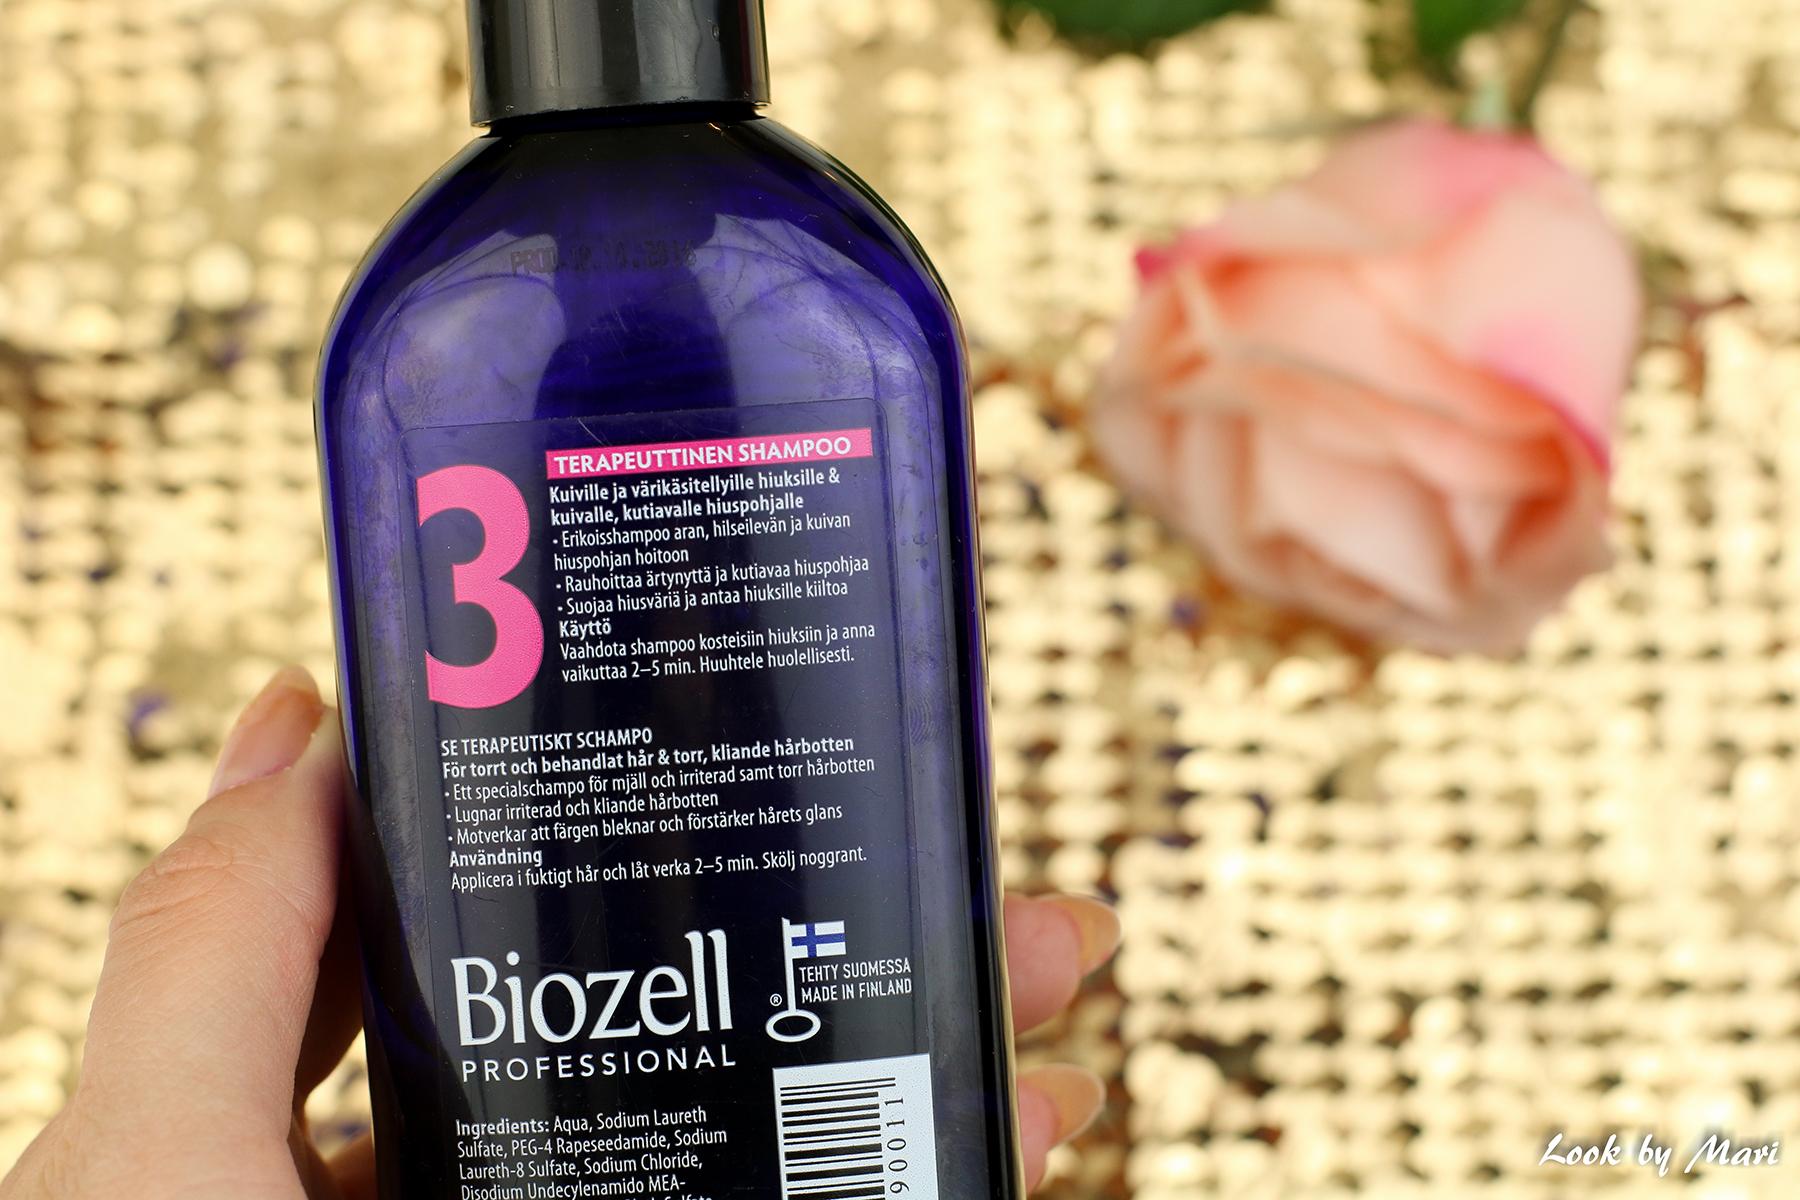 3 biozell therapeutic shampoo 3 kokemuksia review